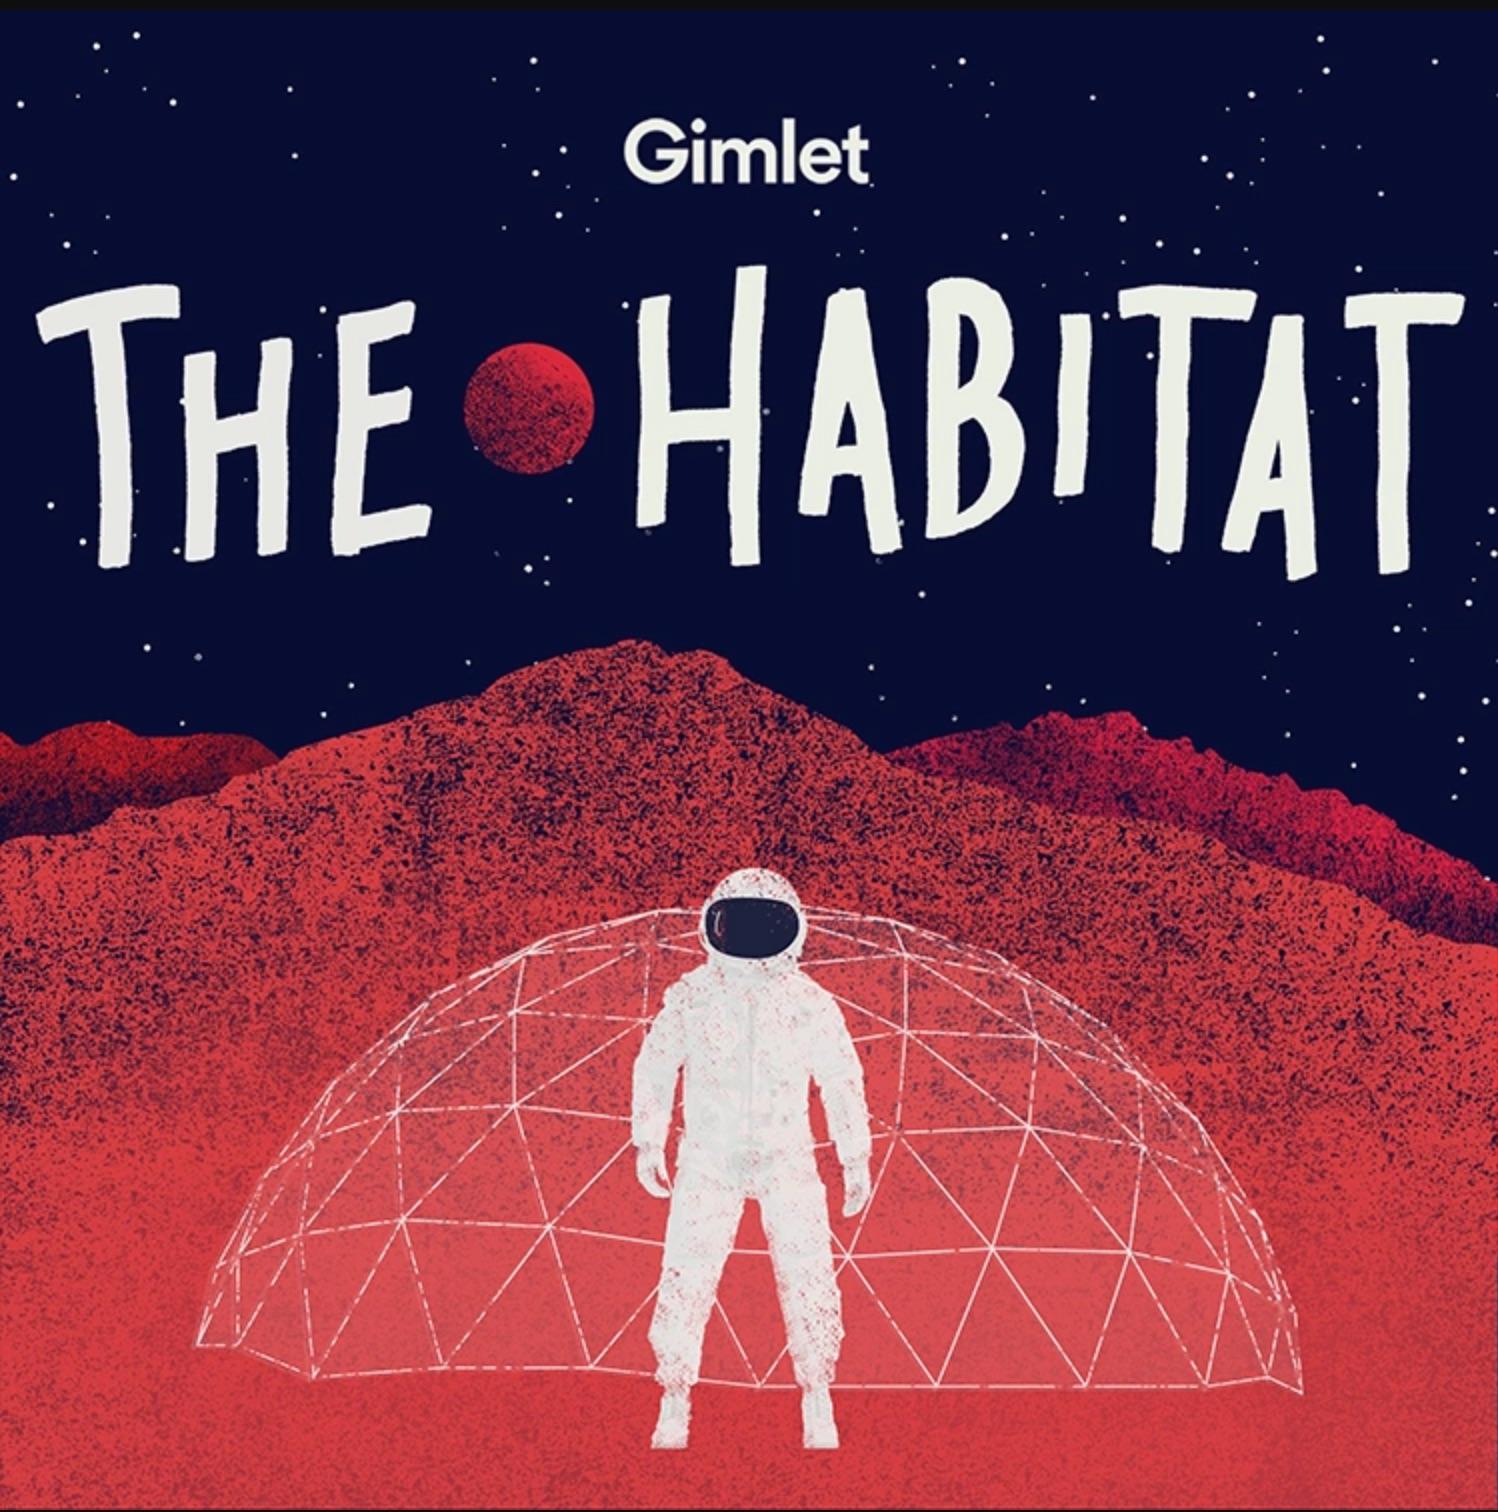 the habitat podcast